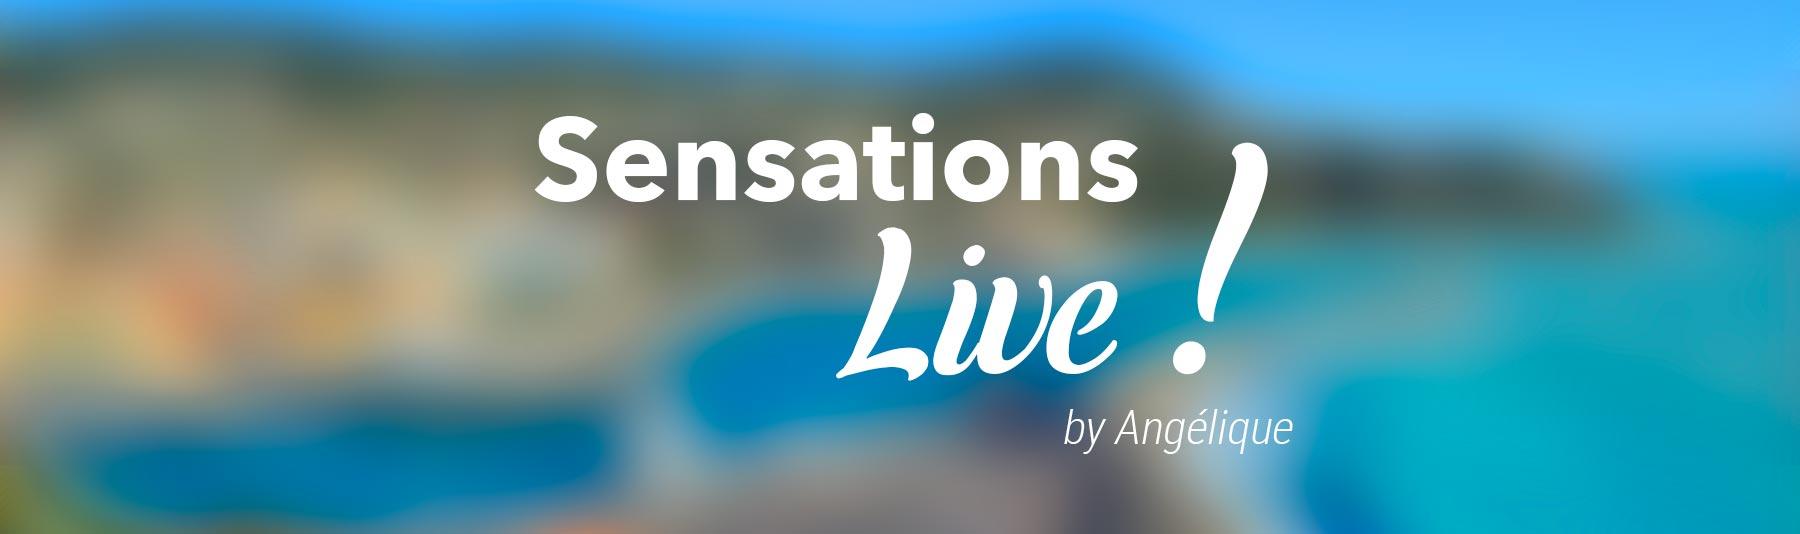 Sensations Live !